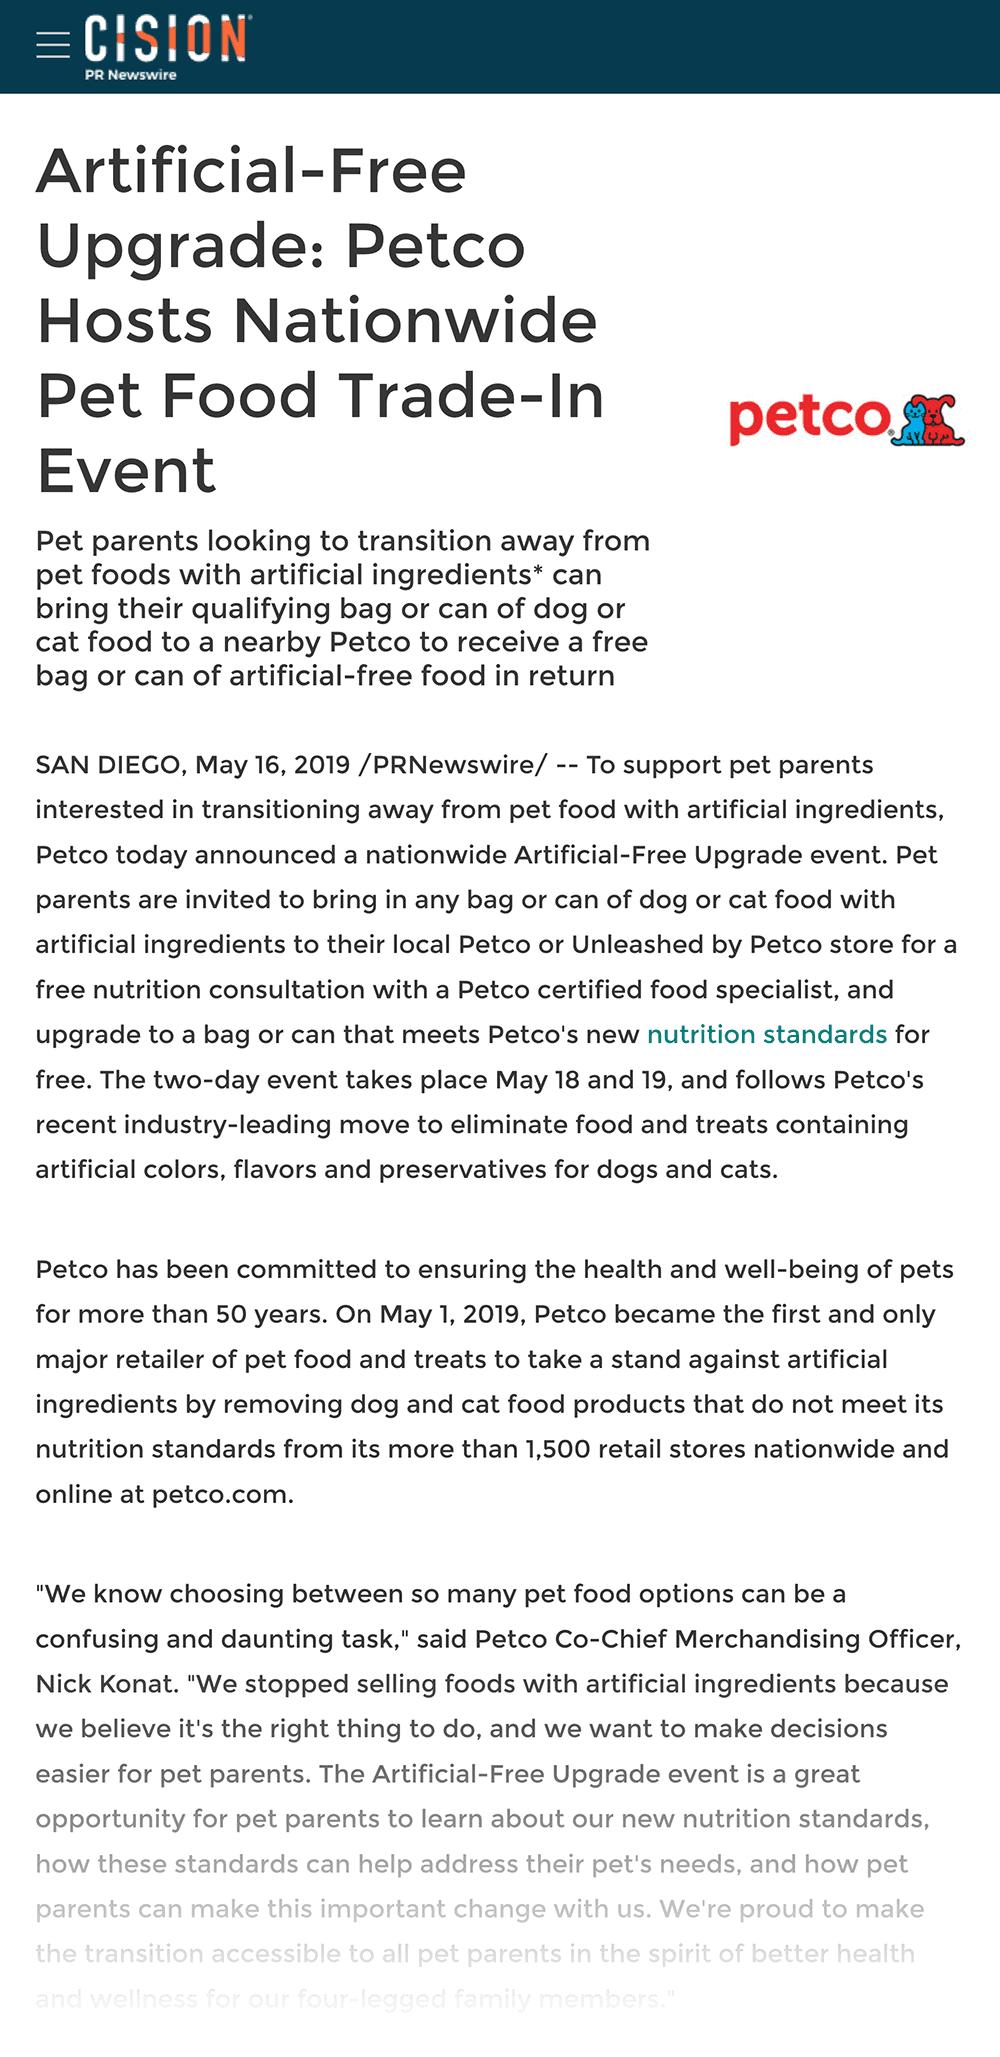 PetCo press release example